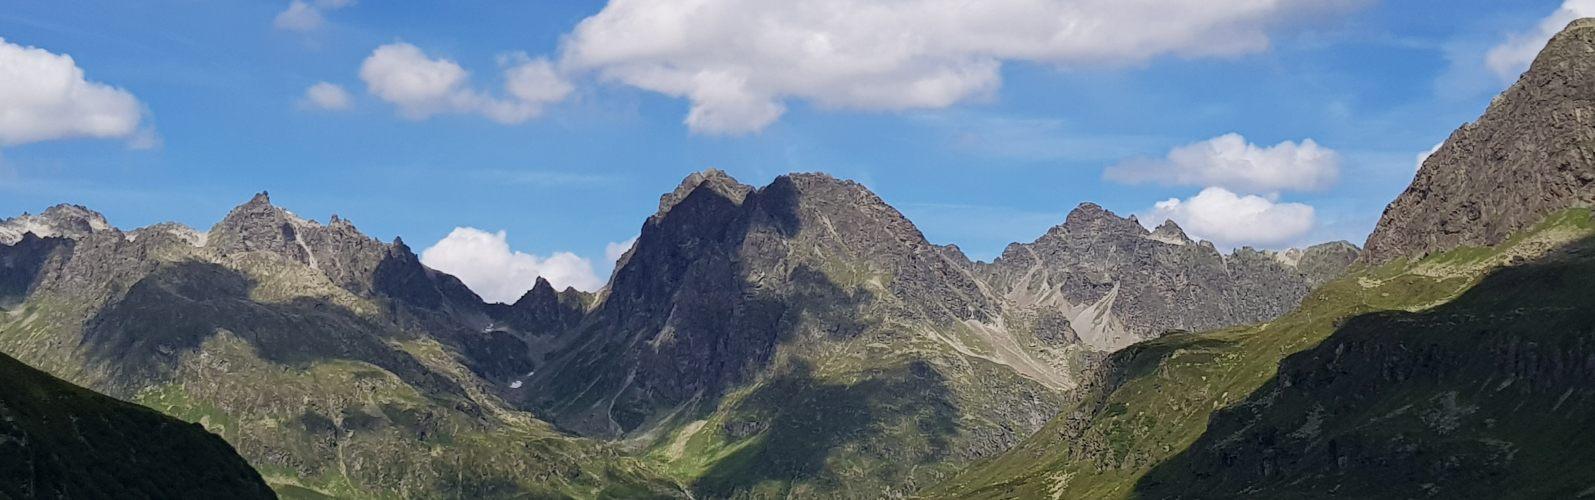 sl_bergen.jpg